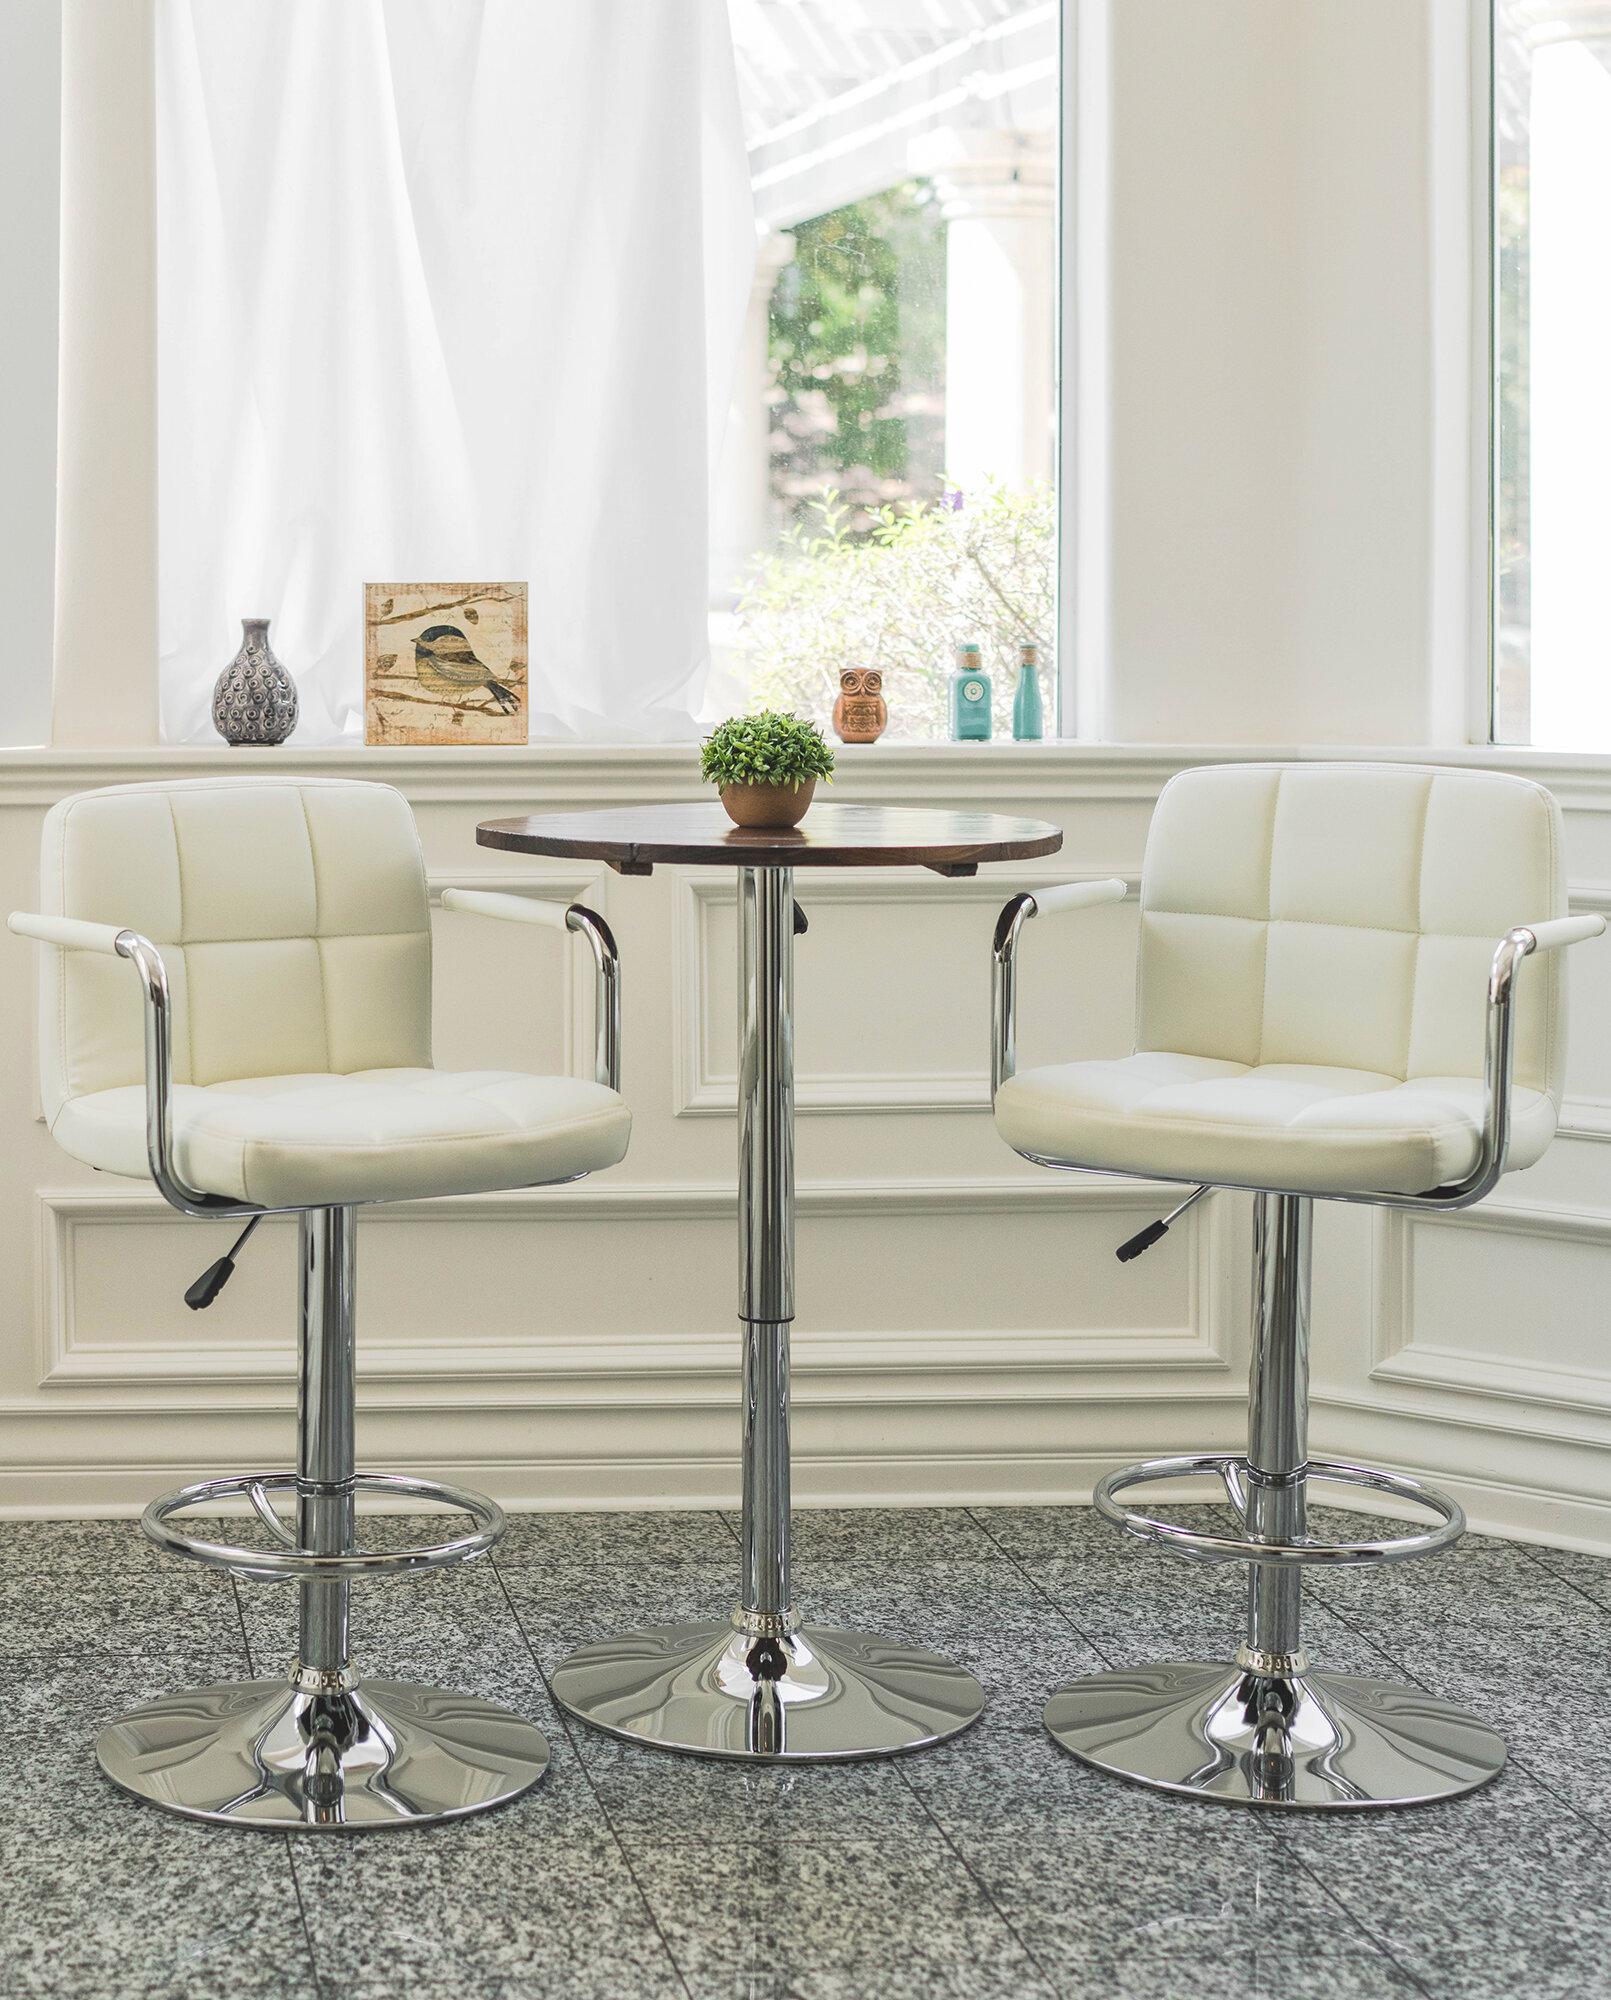 Orren Ellis Wolbert Direct Adjustable Height Swivel Barstool Reviews Wayfair Ca